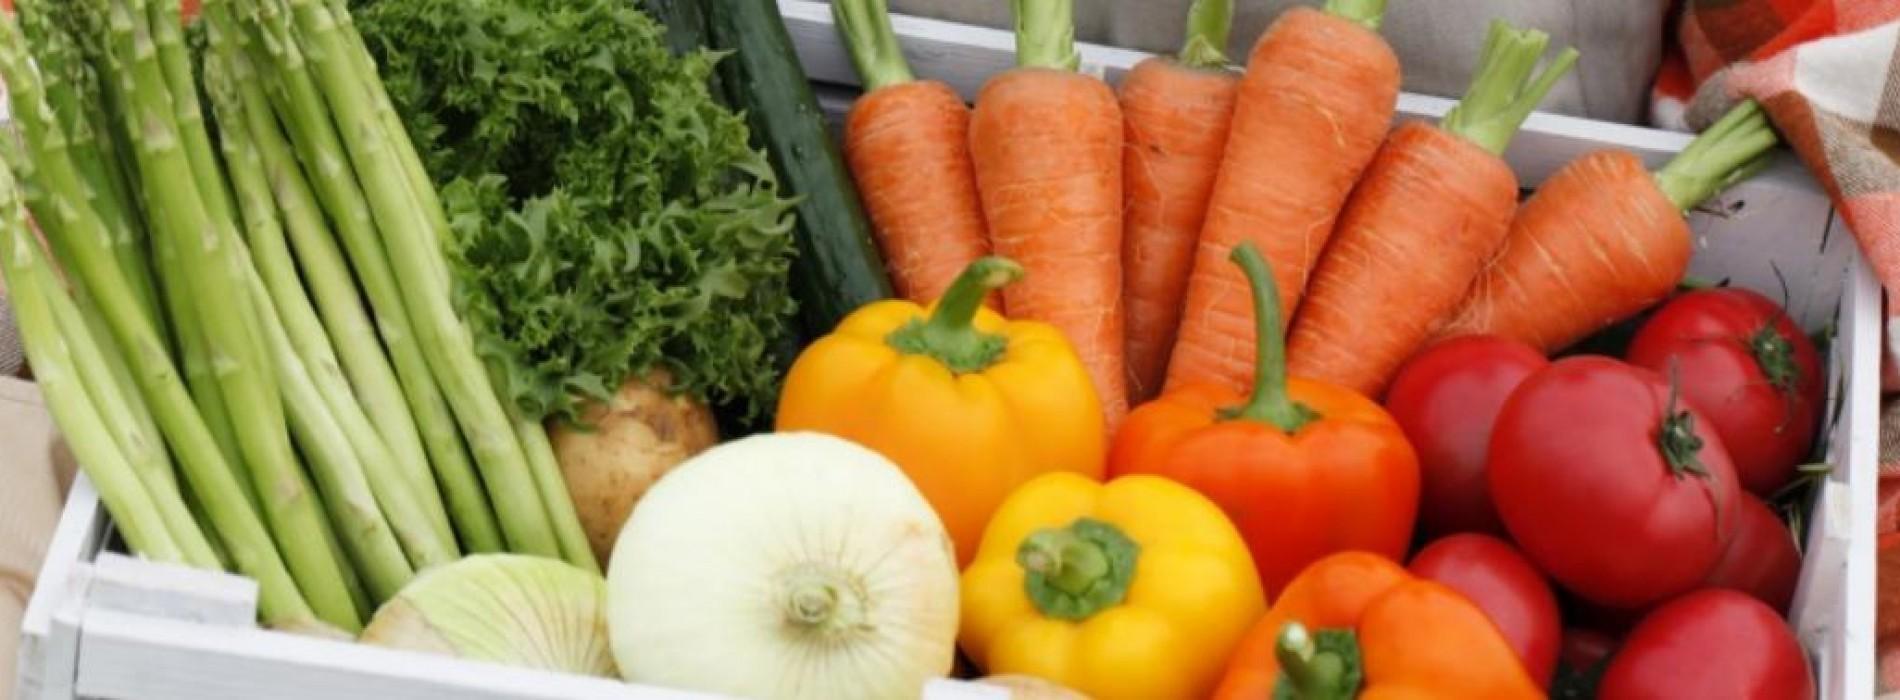 Producenten en consumenten bouwen samen nieuwe voedselmethodes